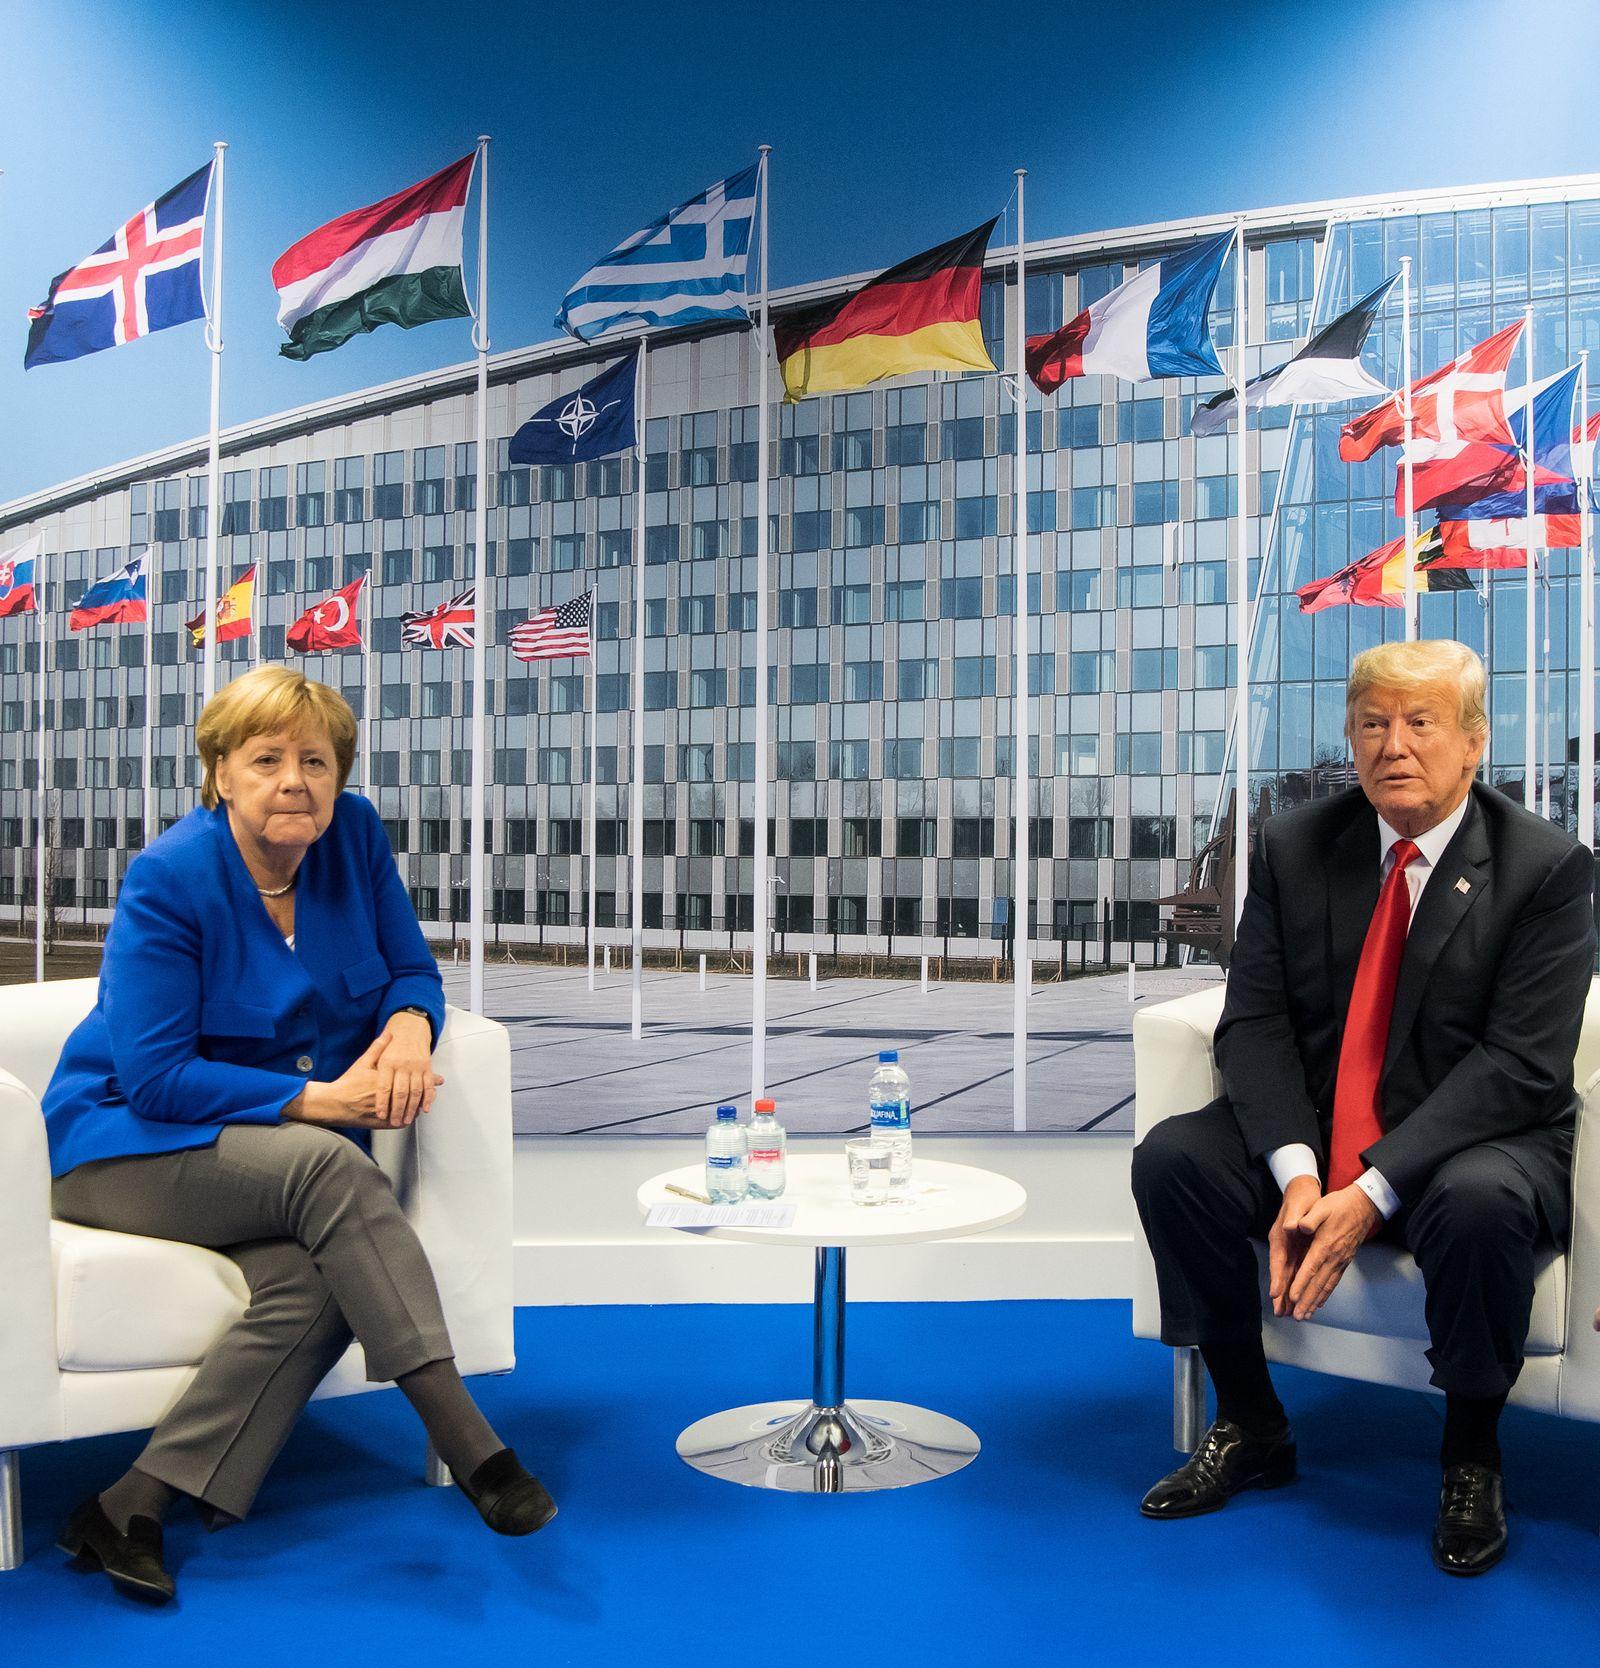 Nato-Gipfel Merkel Trump